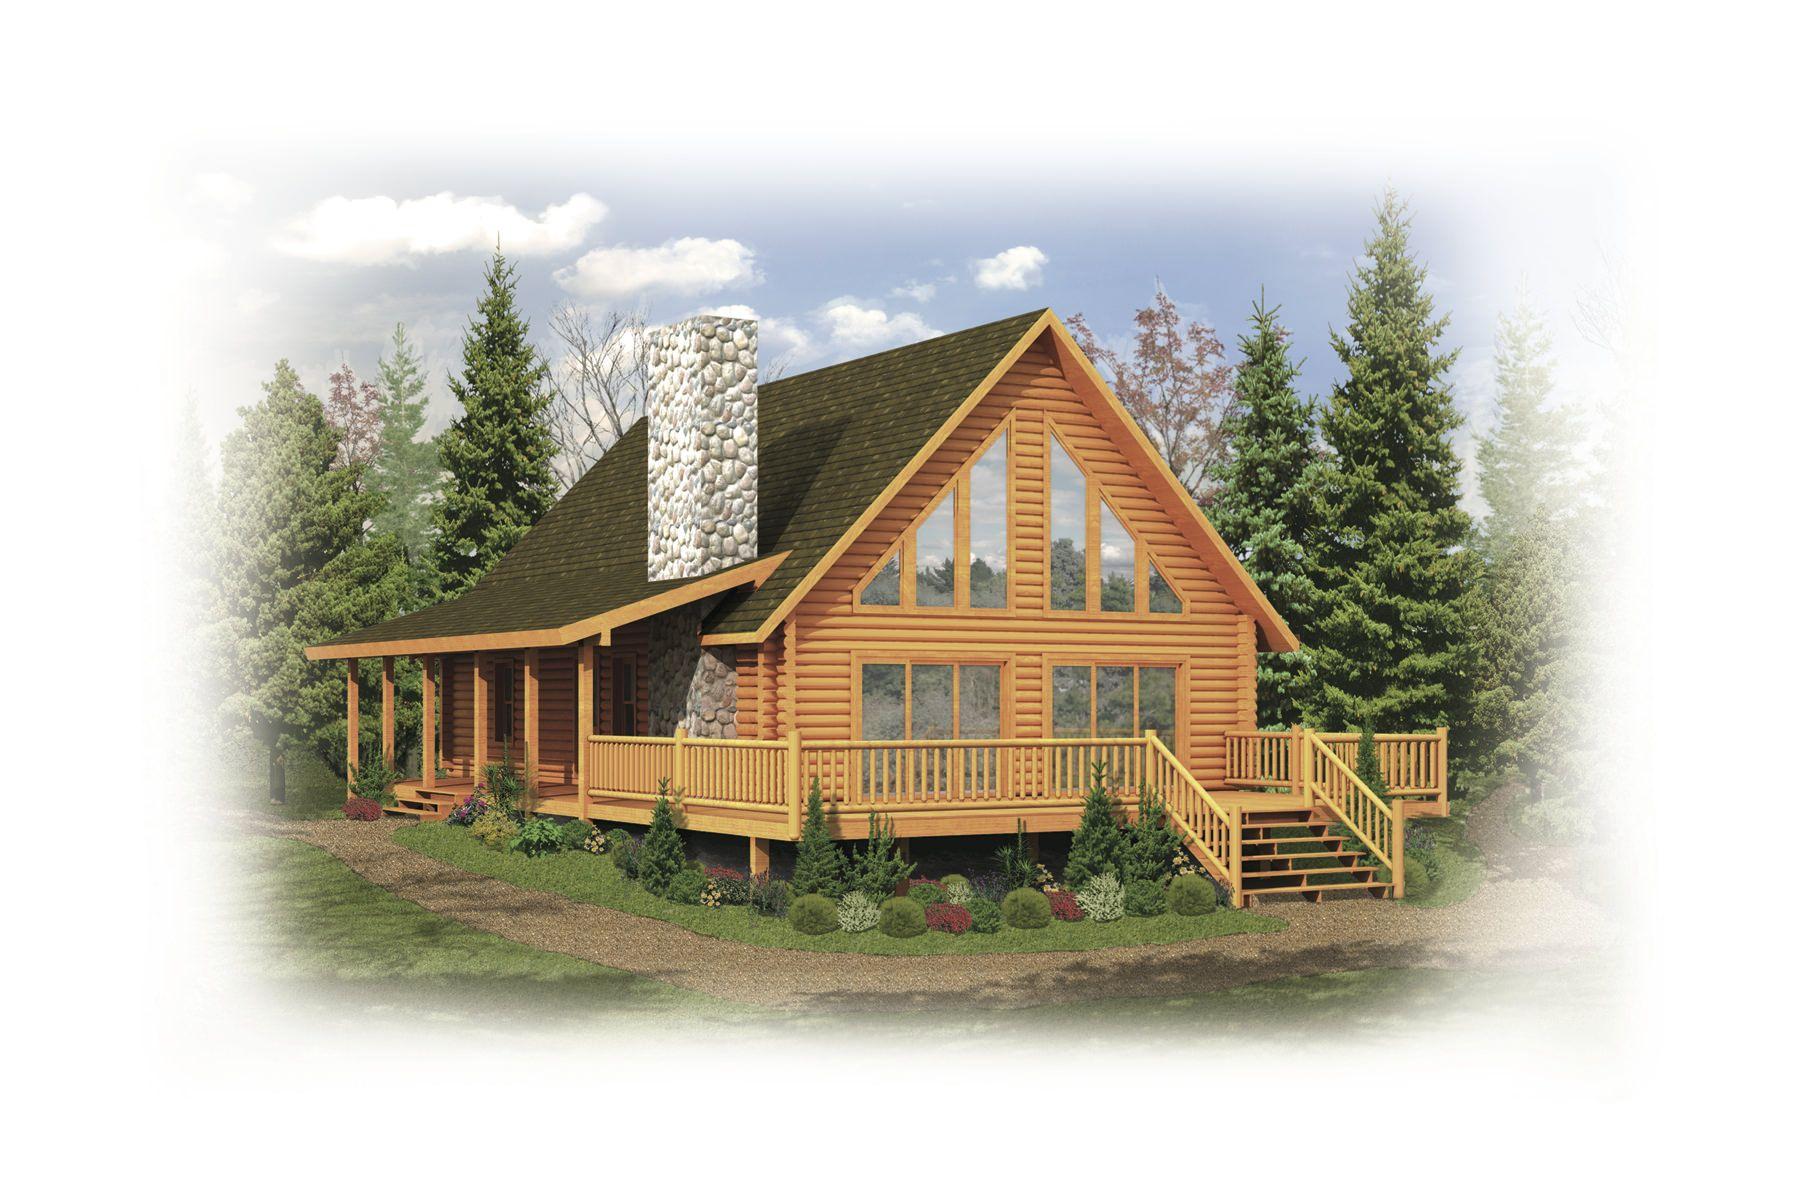 Tomahawk Floor Plan | Strongwood Log Home Company | 3 bed 2 bath | 1939 Sq  Ft | Cottage house plans, Log home plan, Log homes